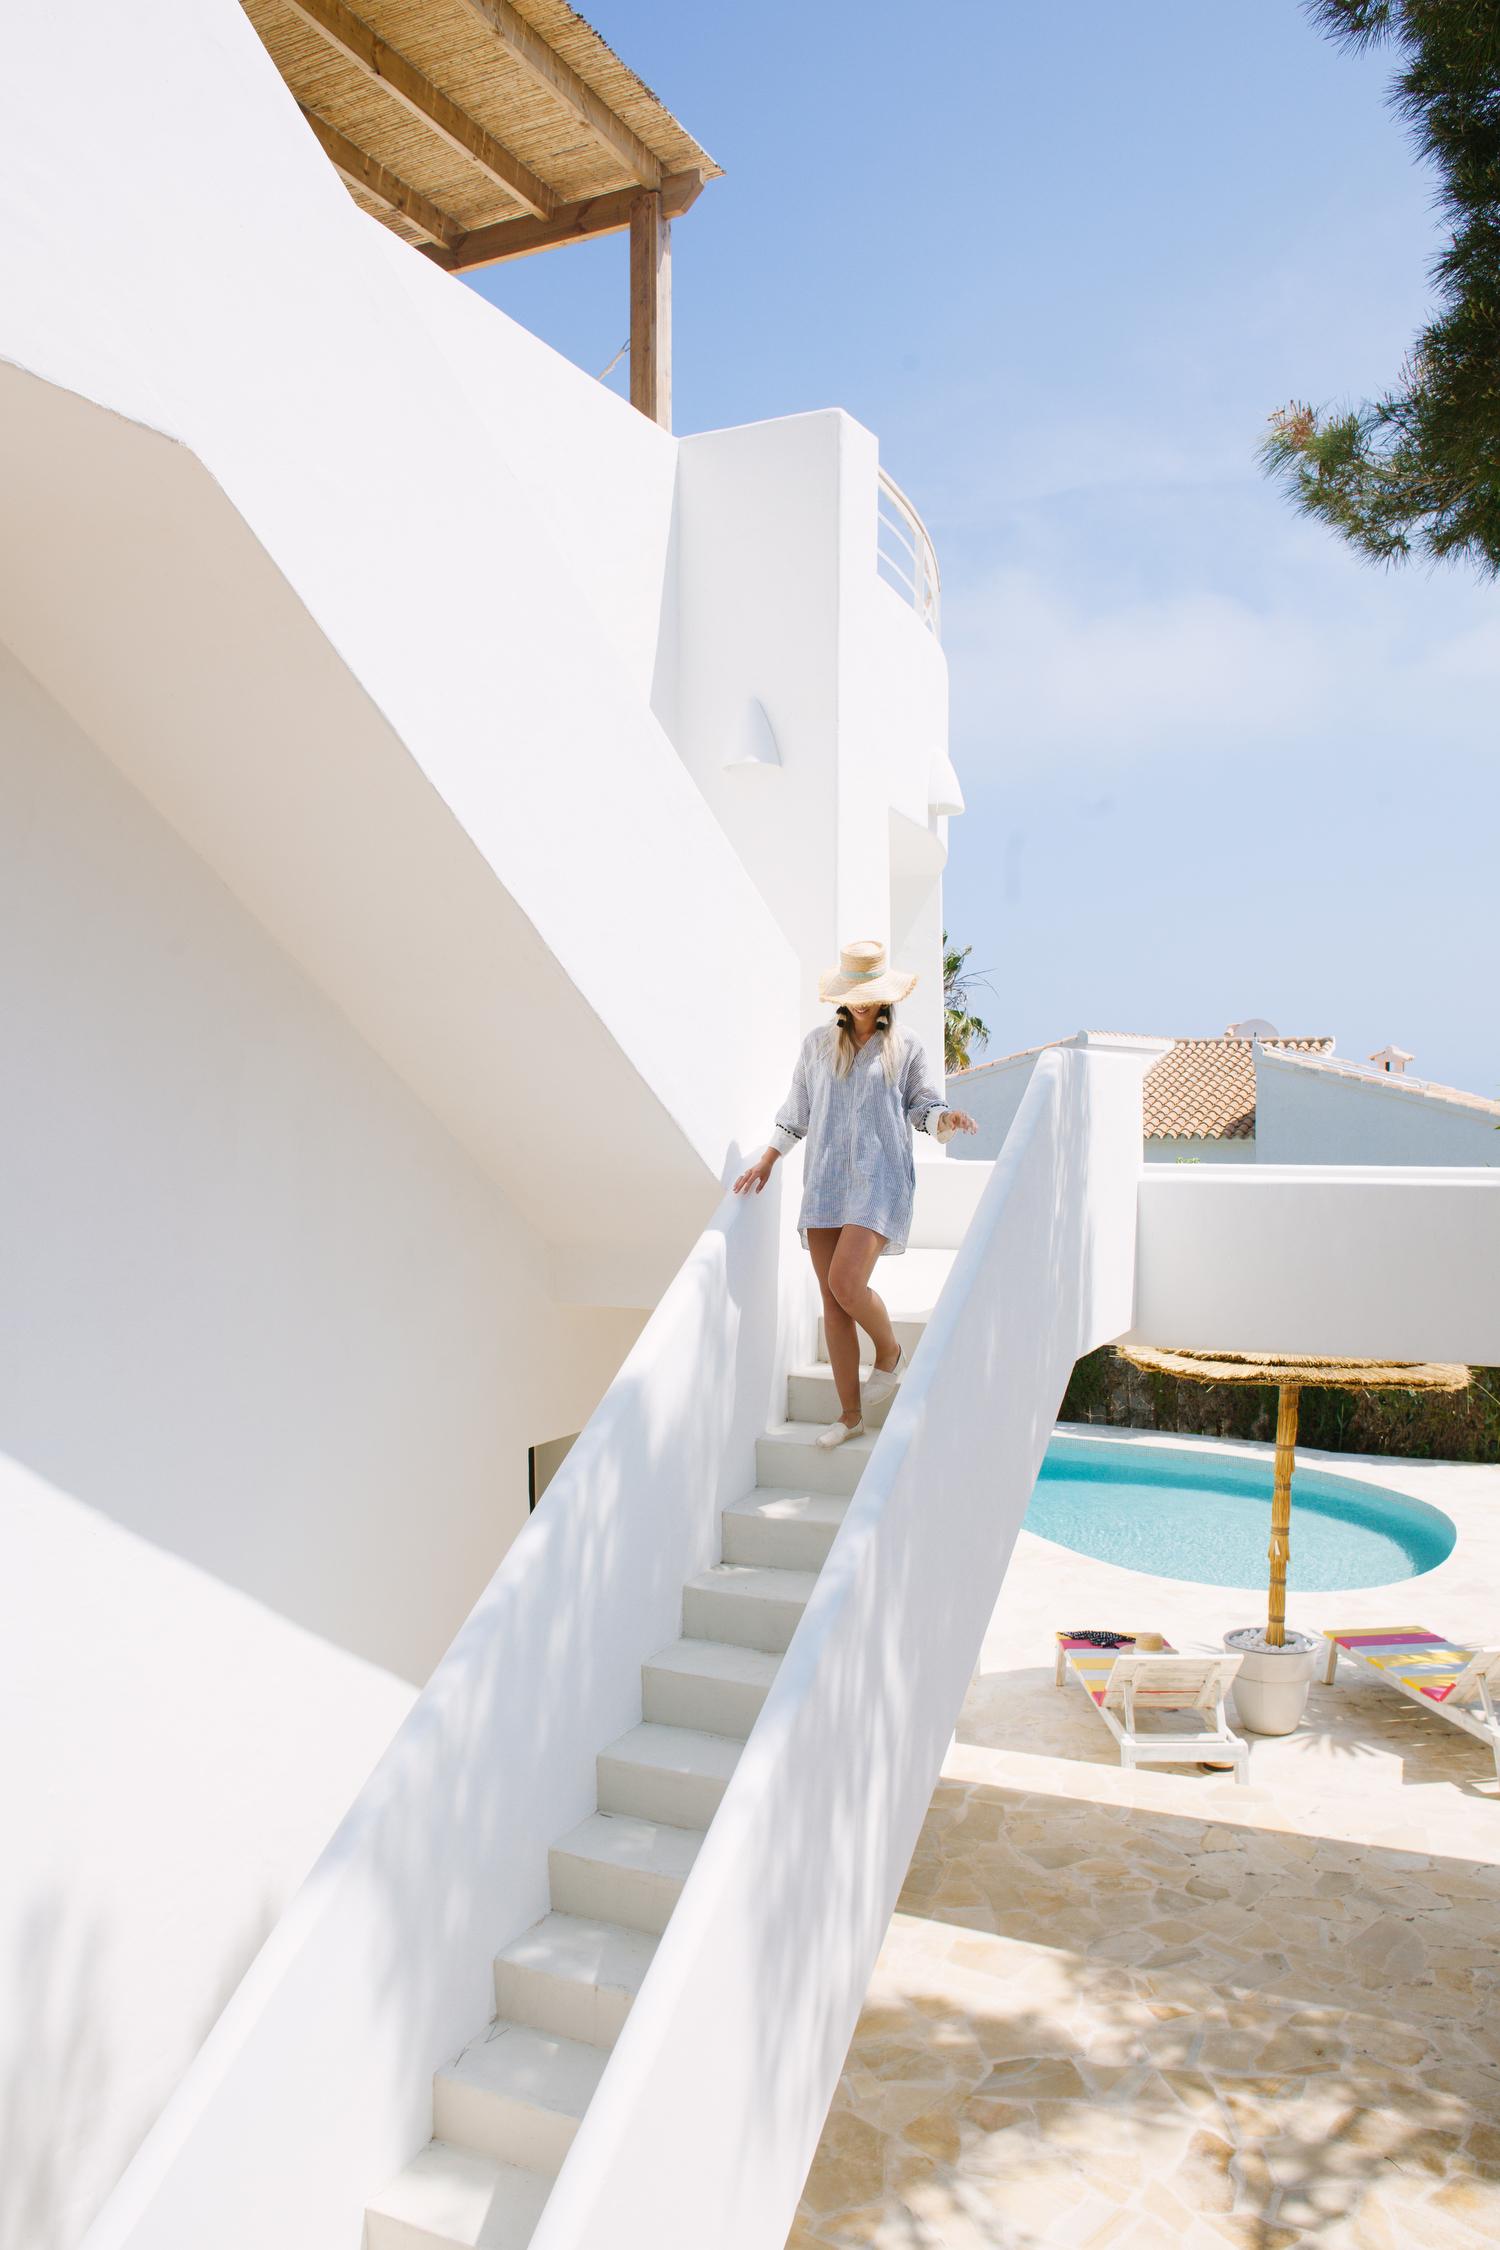 jessica_bataille_living_mediterranean_homes_workhouse_collective_57jessica_bataille_living_mediterranean_homes_workhouse_collective_IMG_9756.jpg_57.JPG